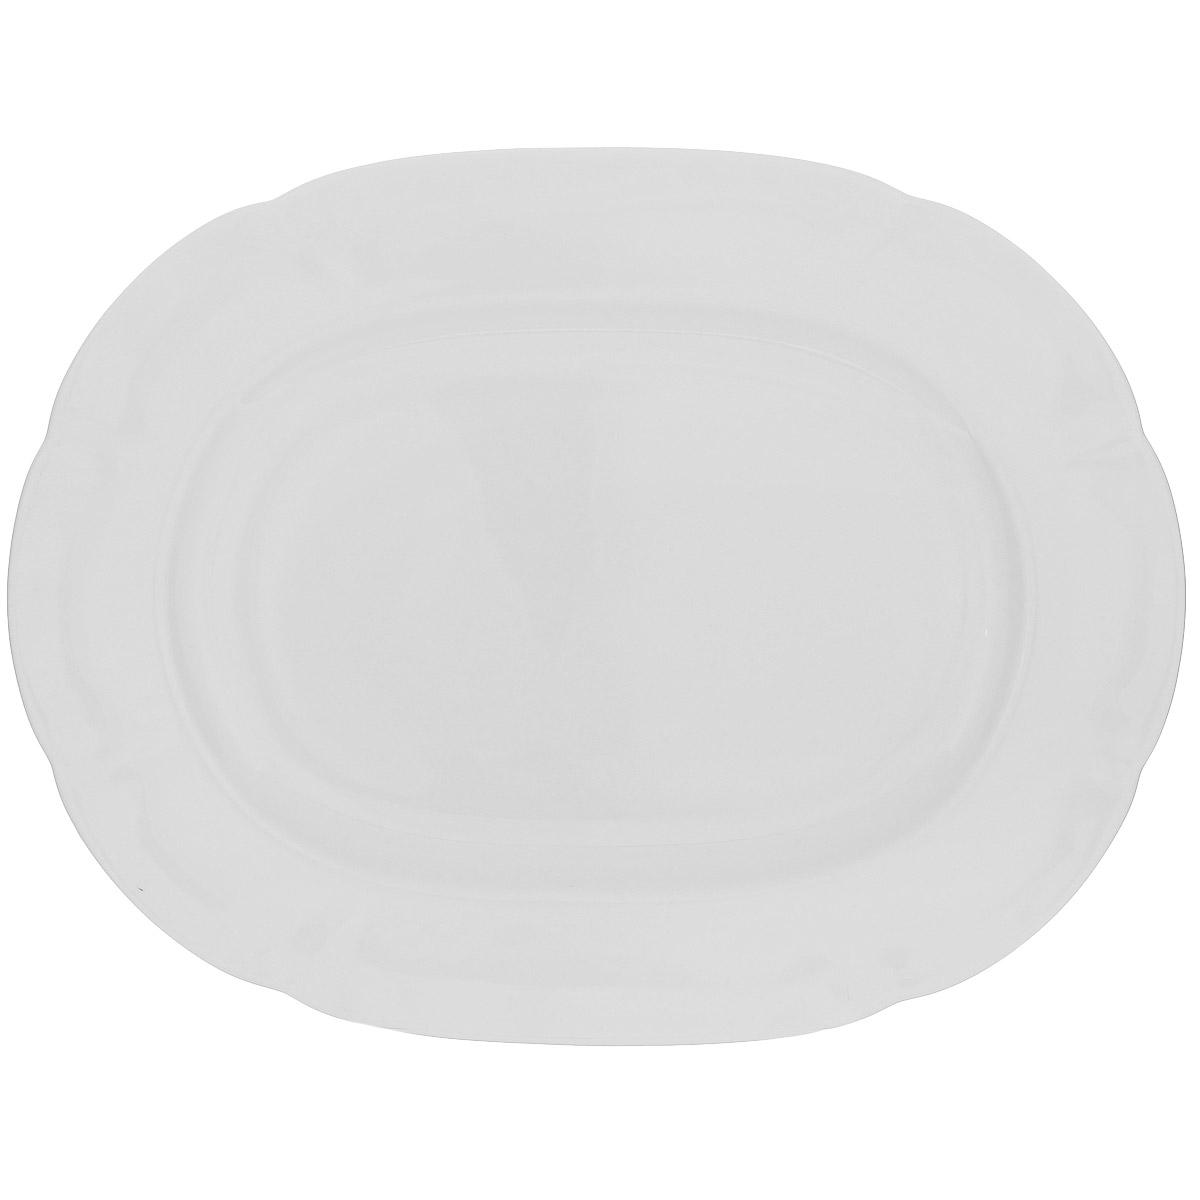 Блюдо Royal Bone China White, 32 х 25 см